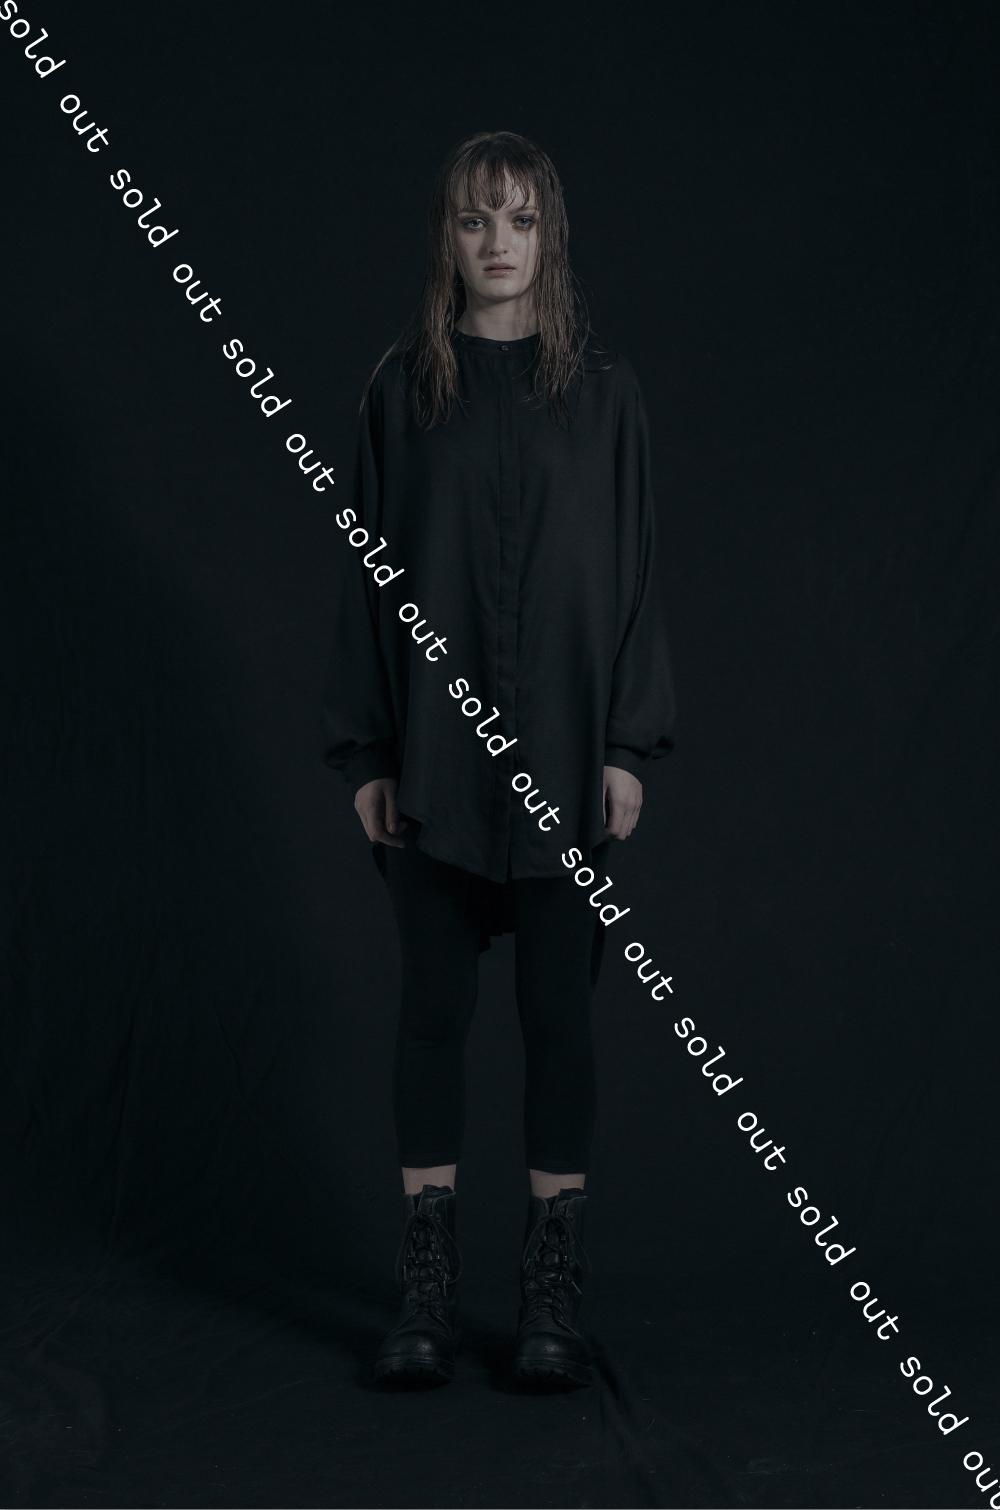 jason-lingard-razor-shirt-agoraphobia